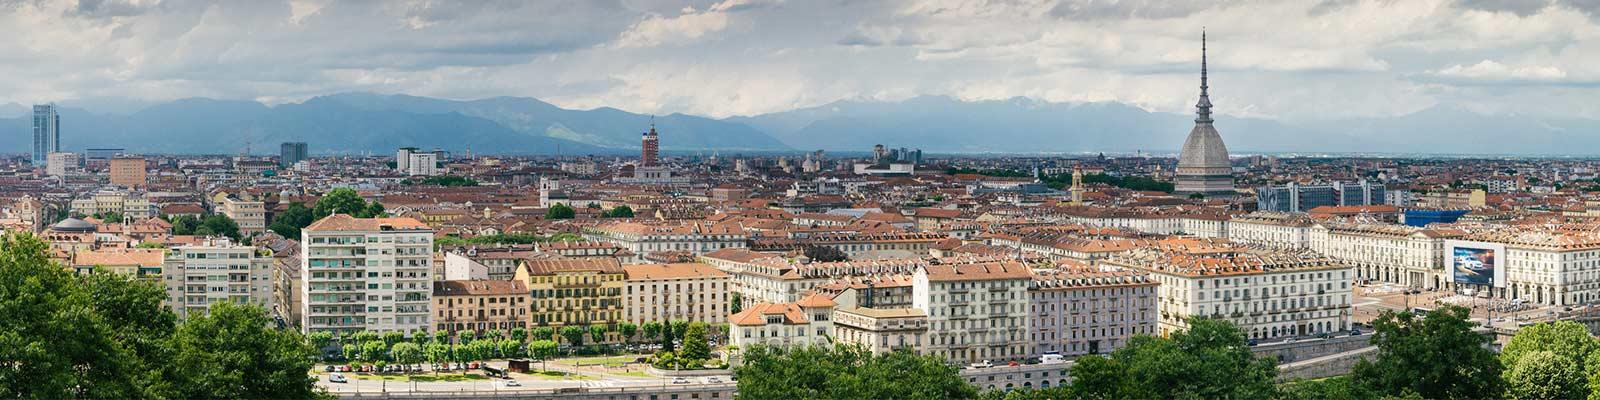 ایتالیا، تورین